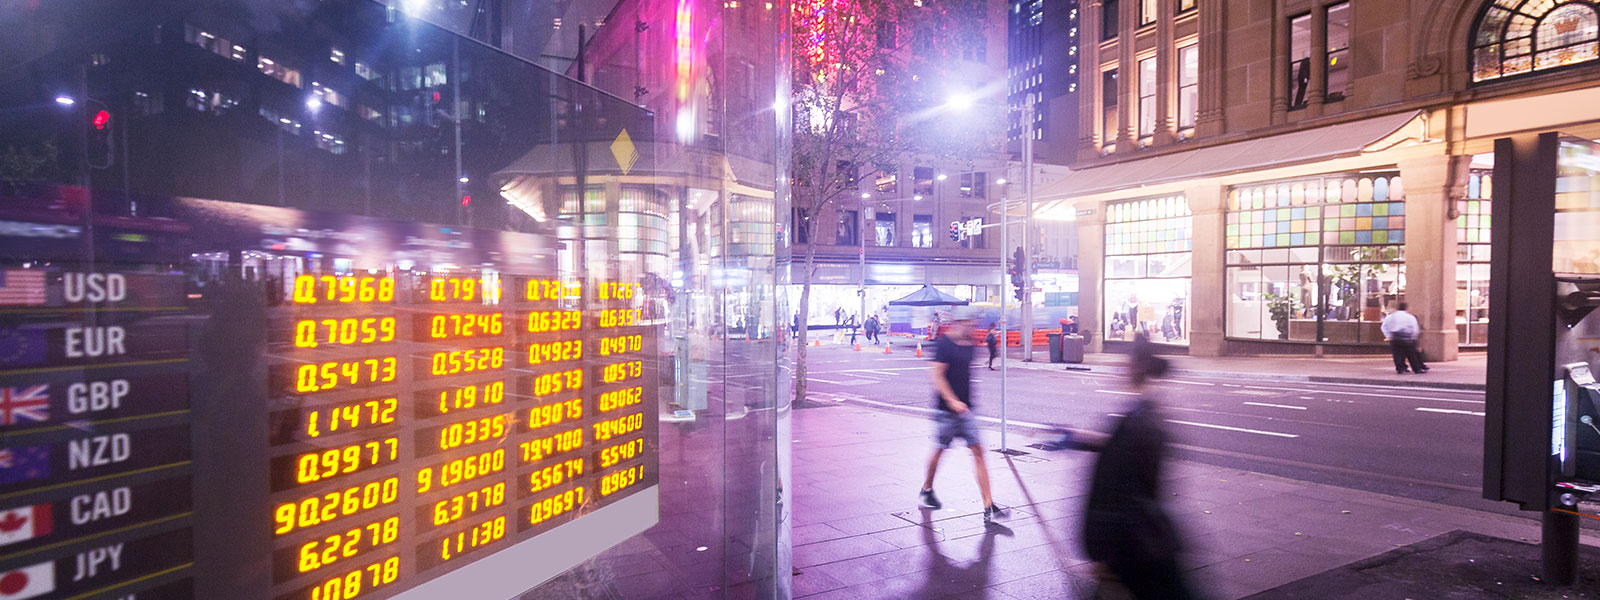 Market rates display